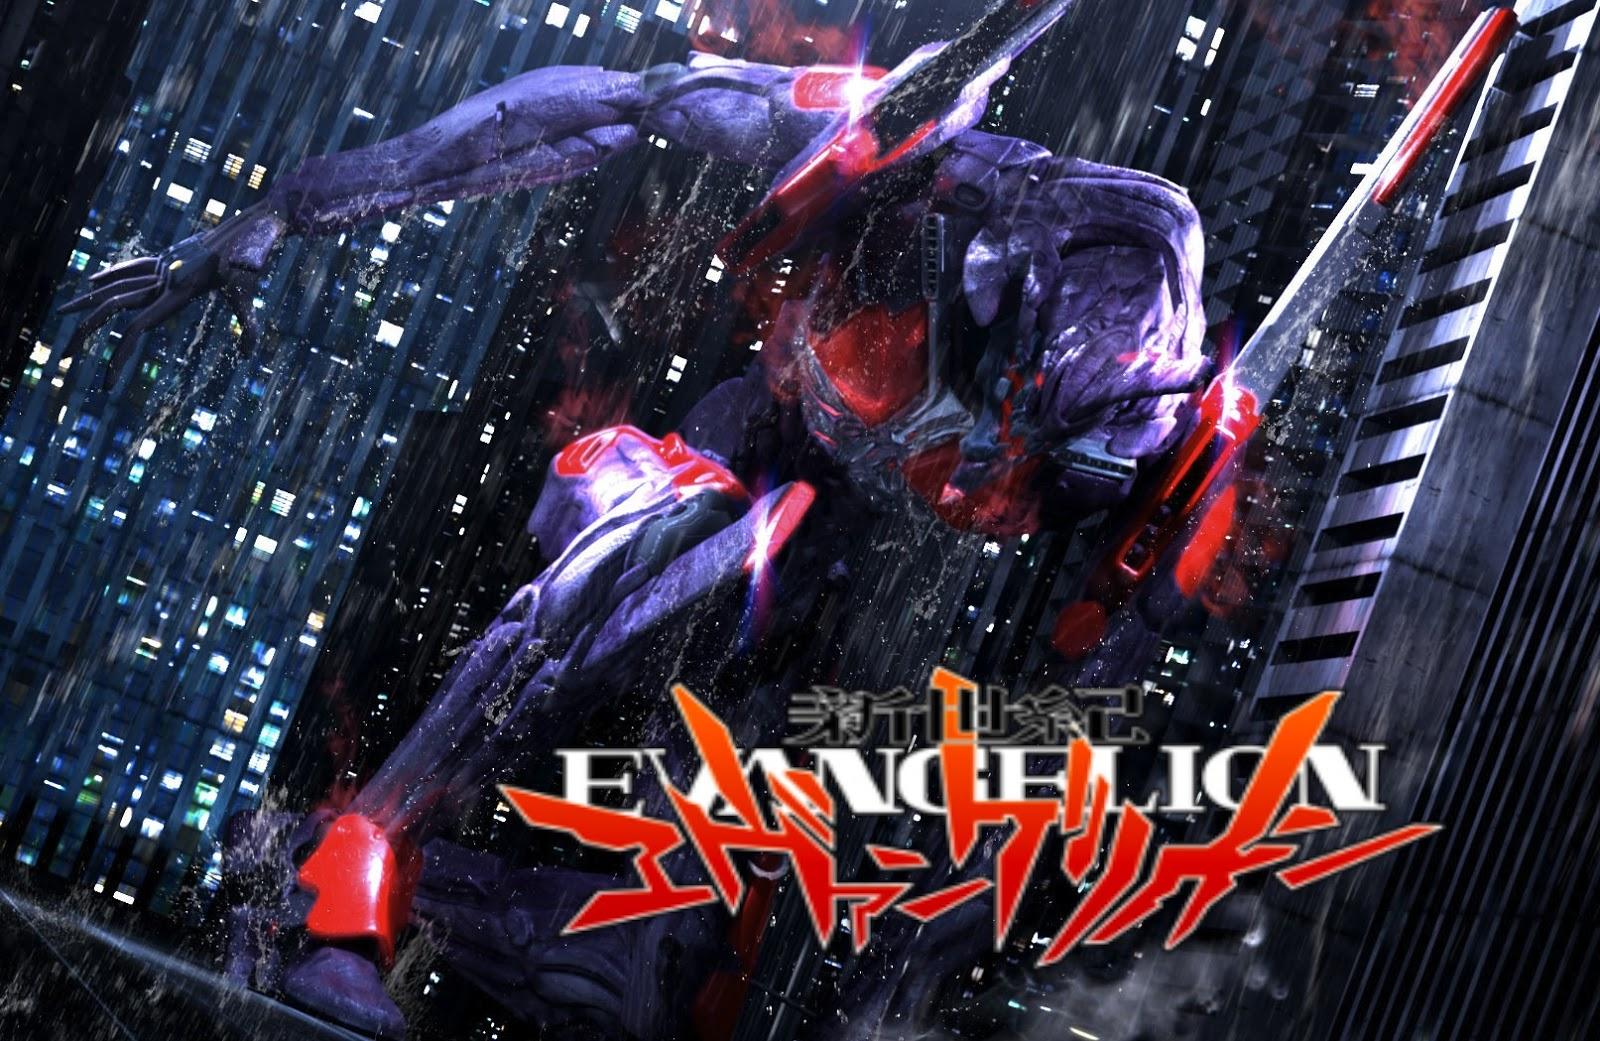 Evangelion Film